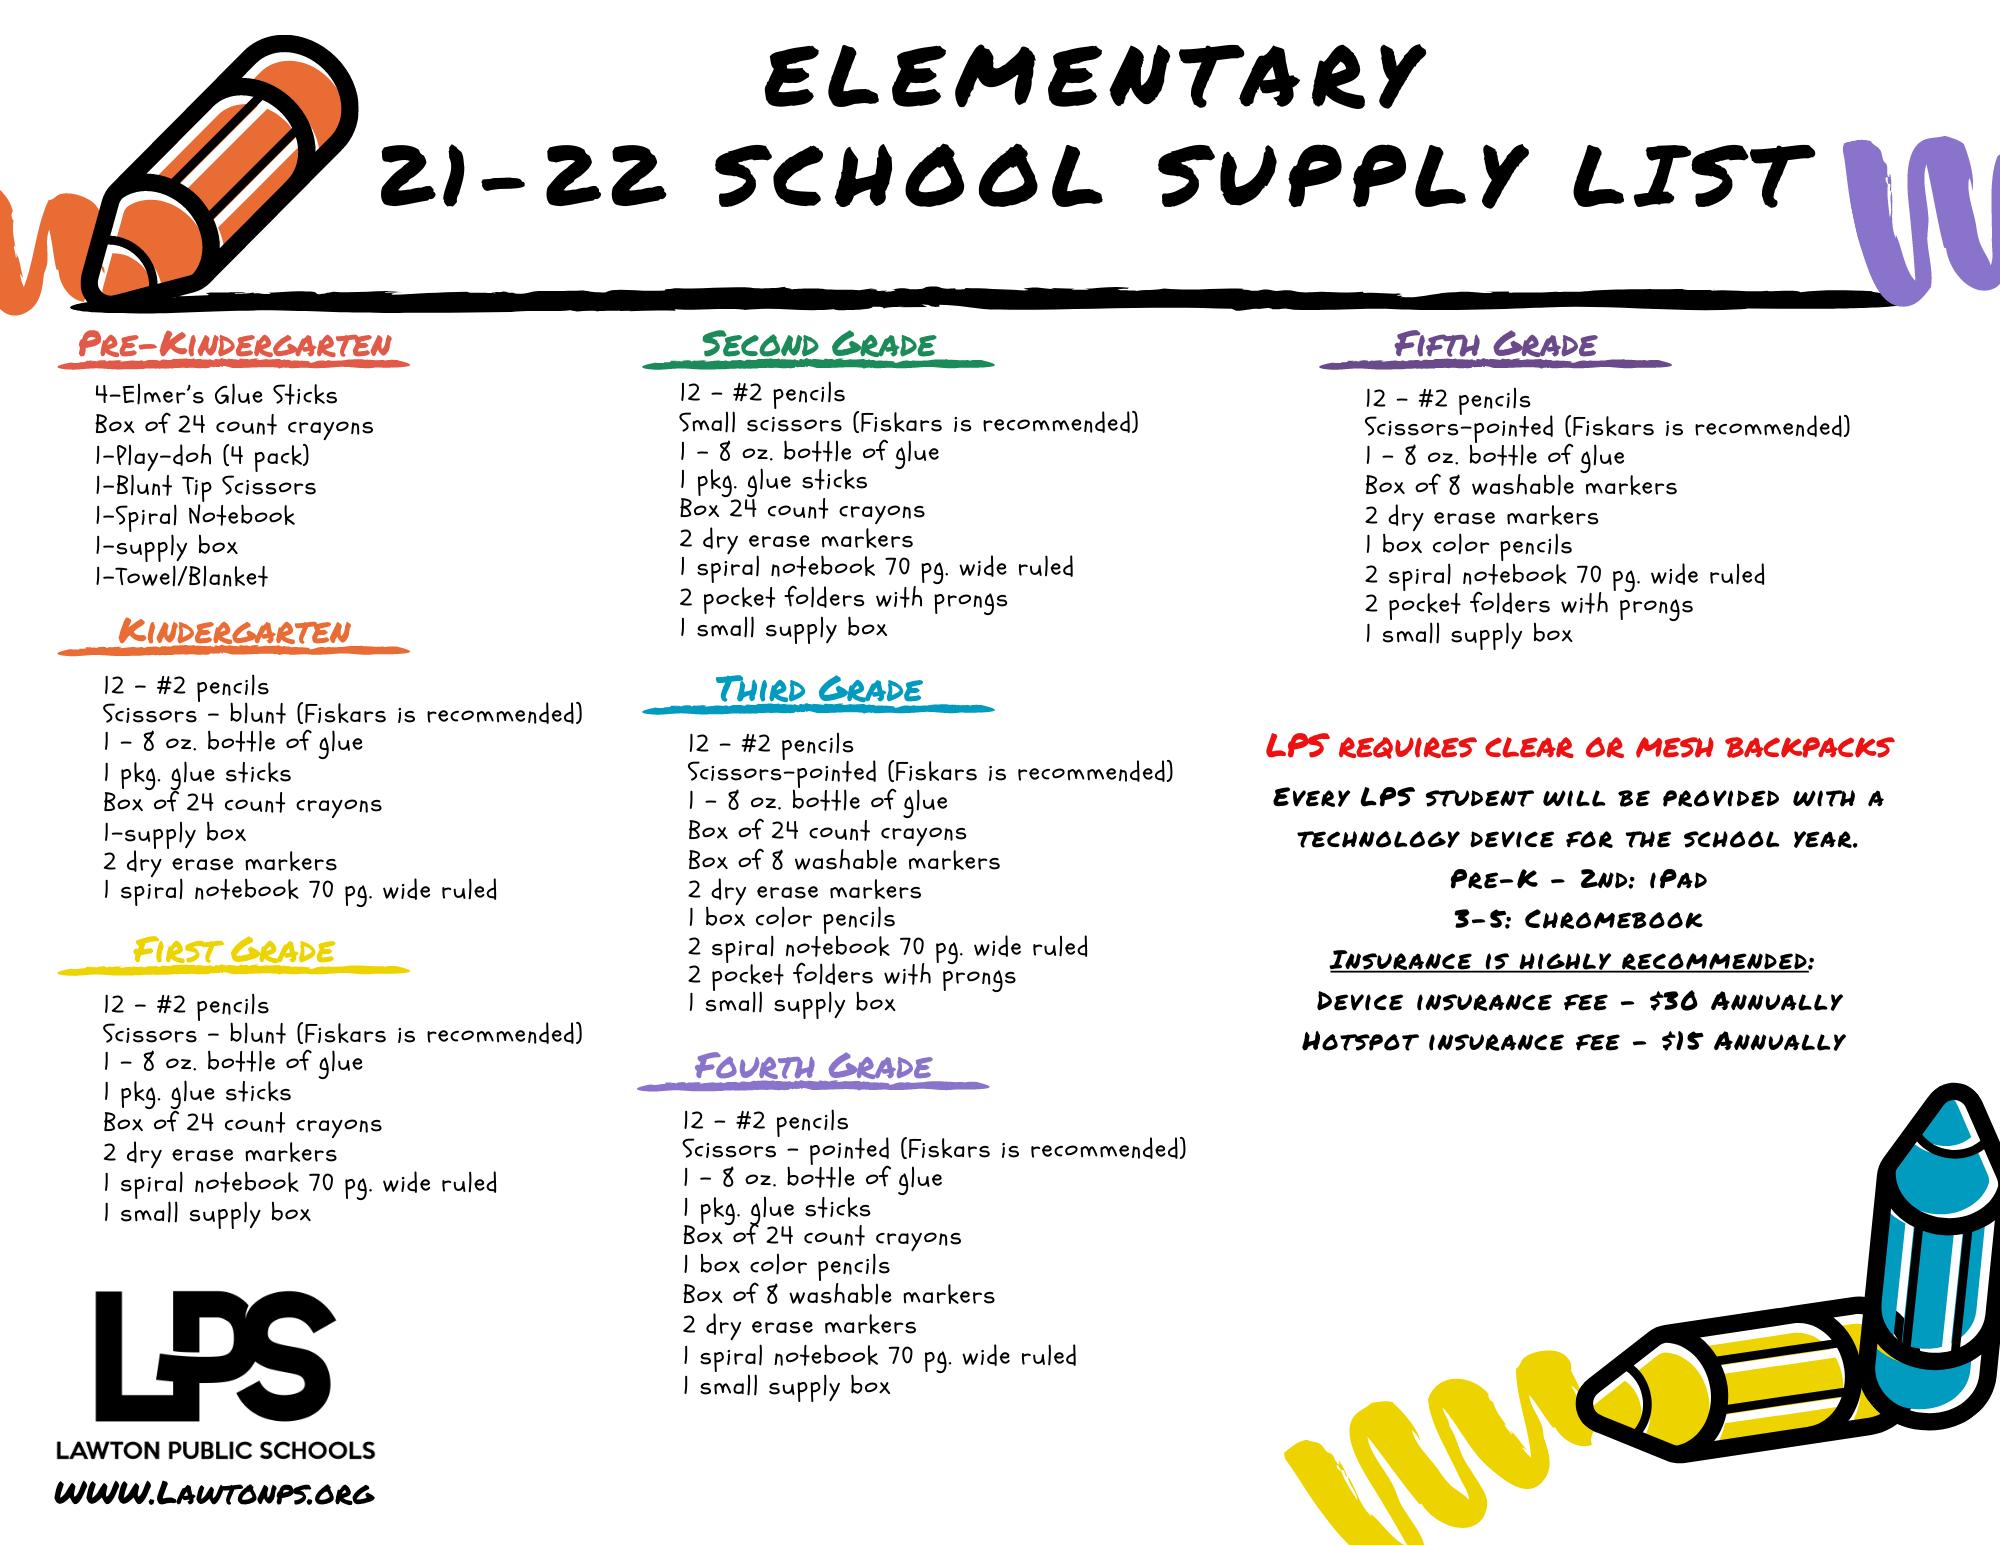 Elementary School Supply Lists